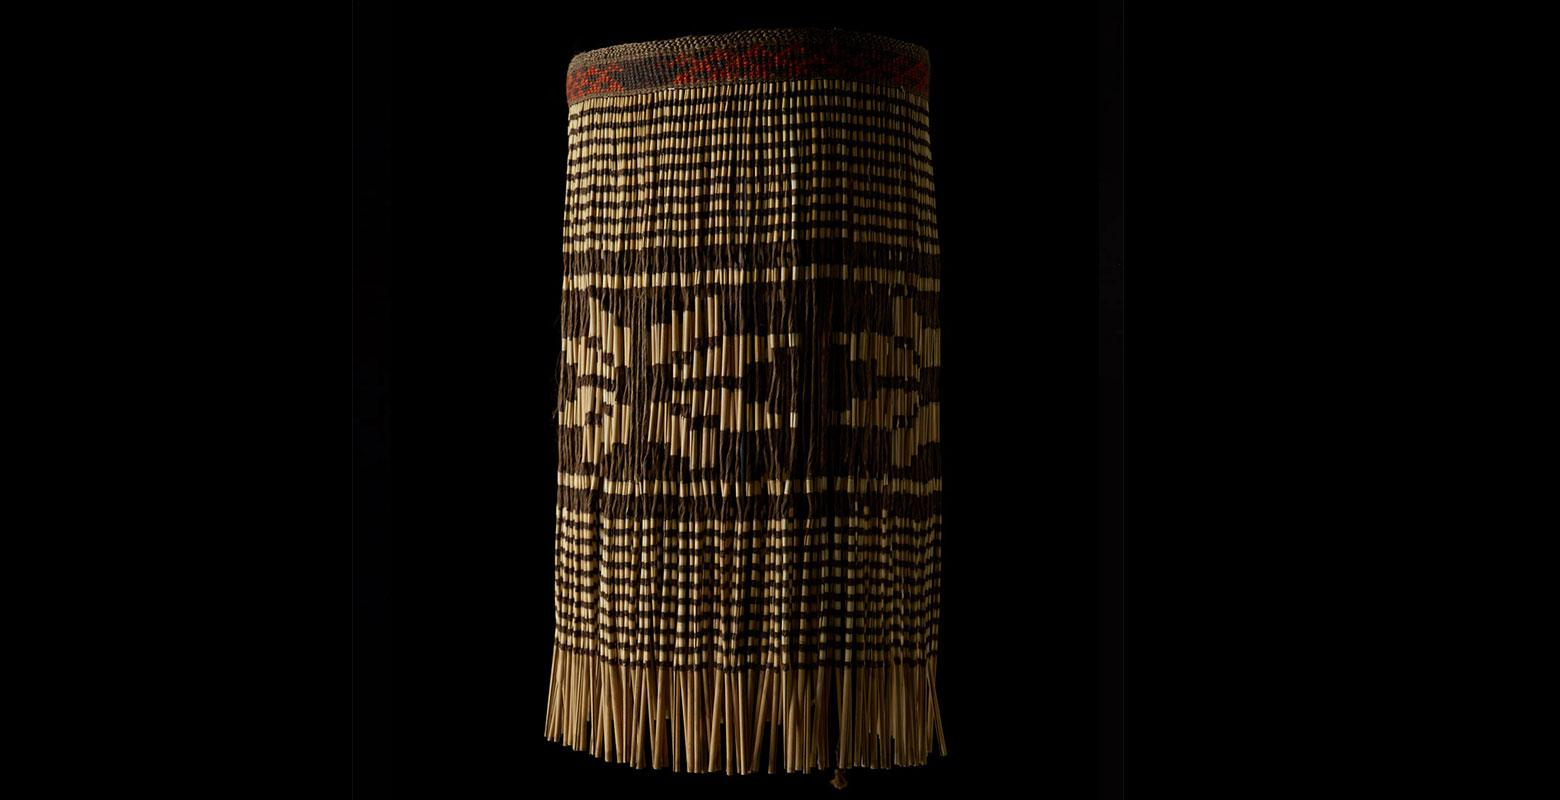 A skirt-like garment made of flax strands